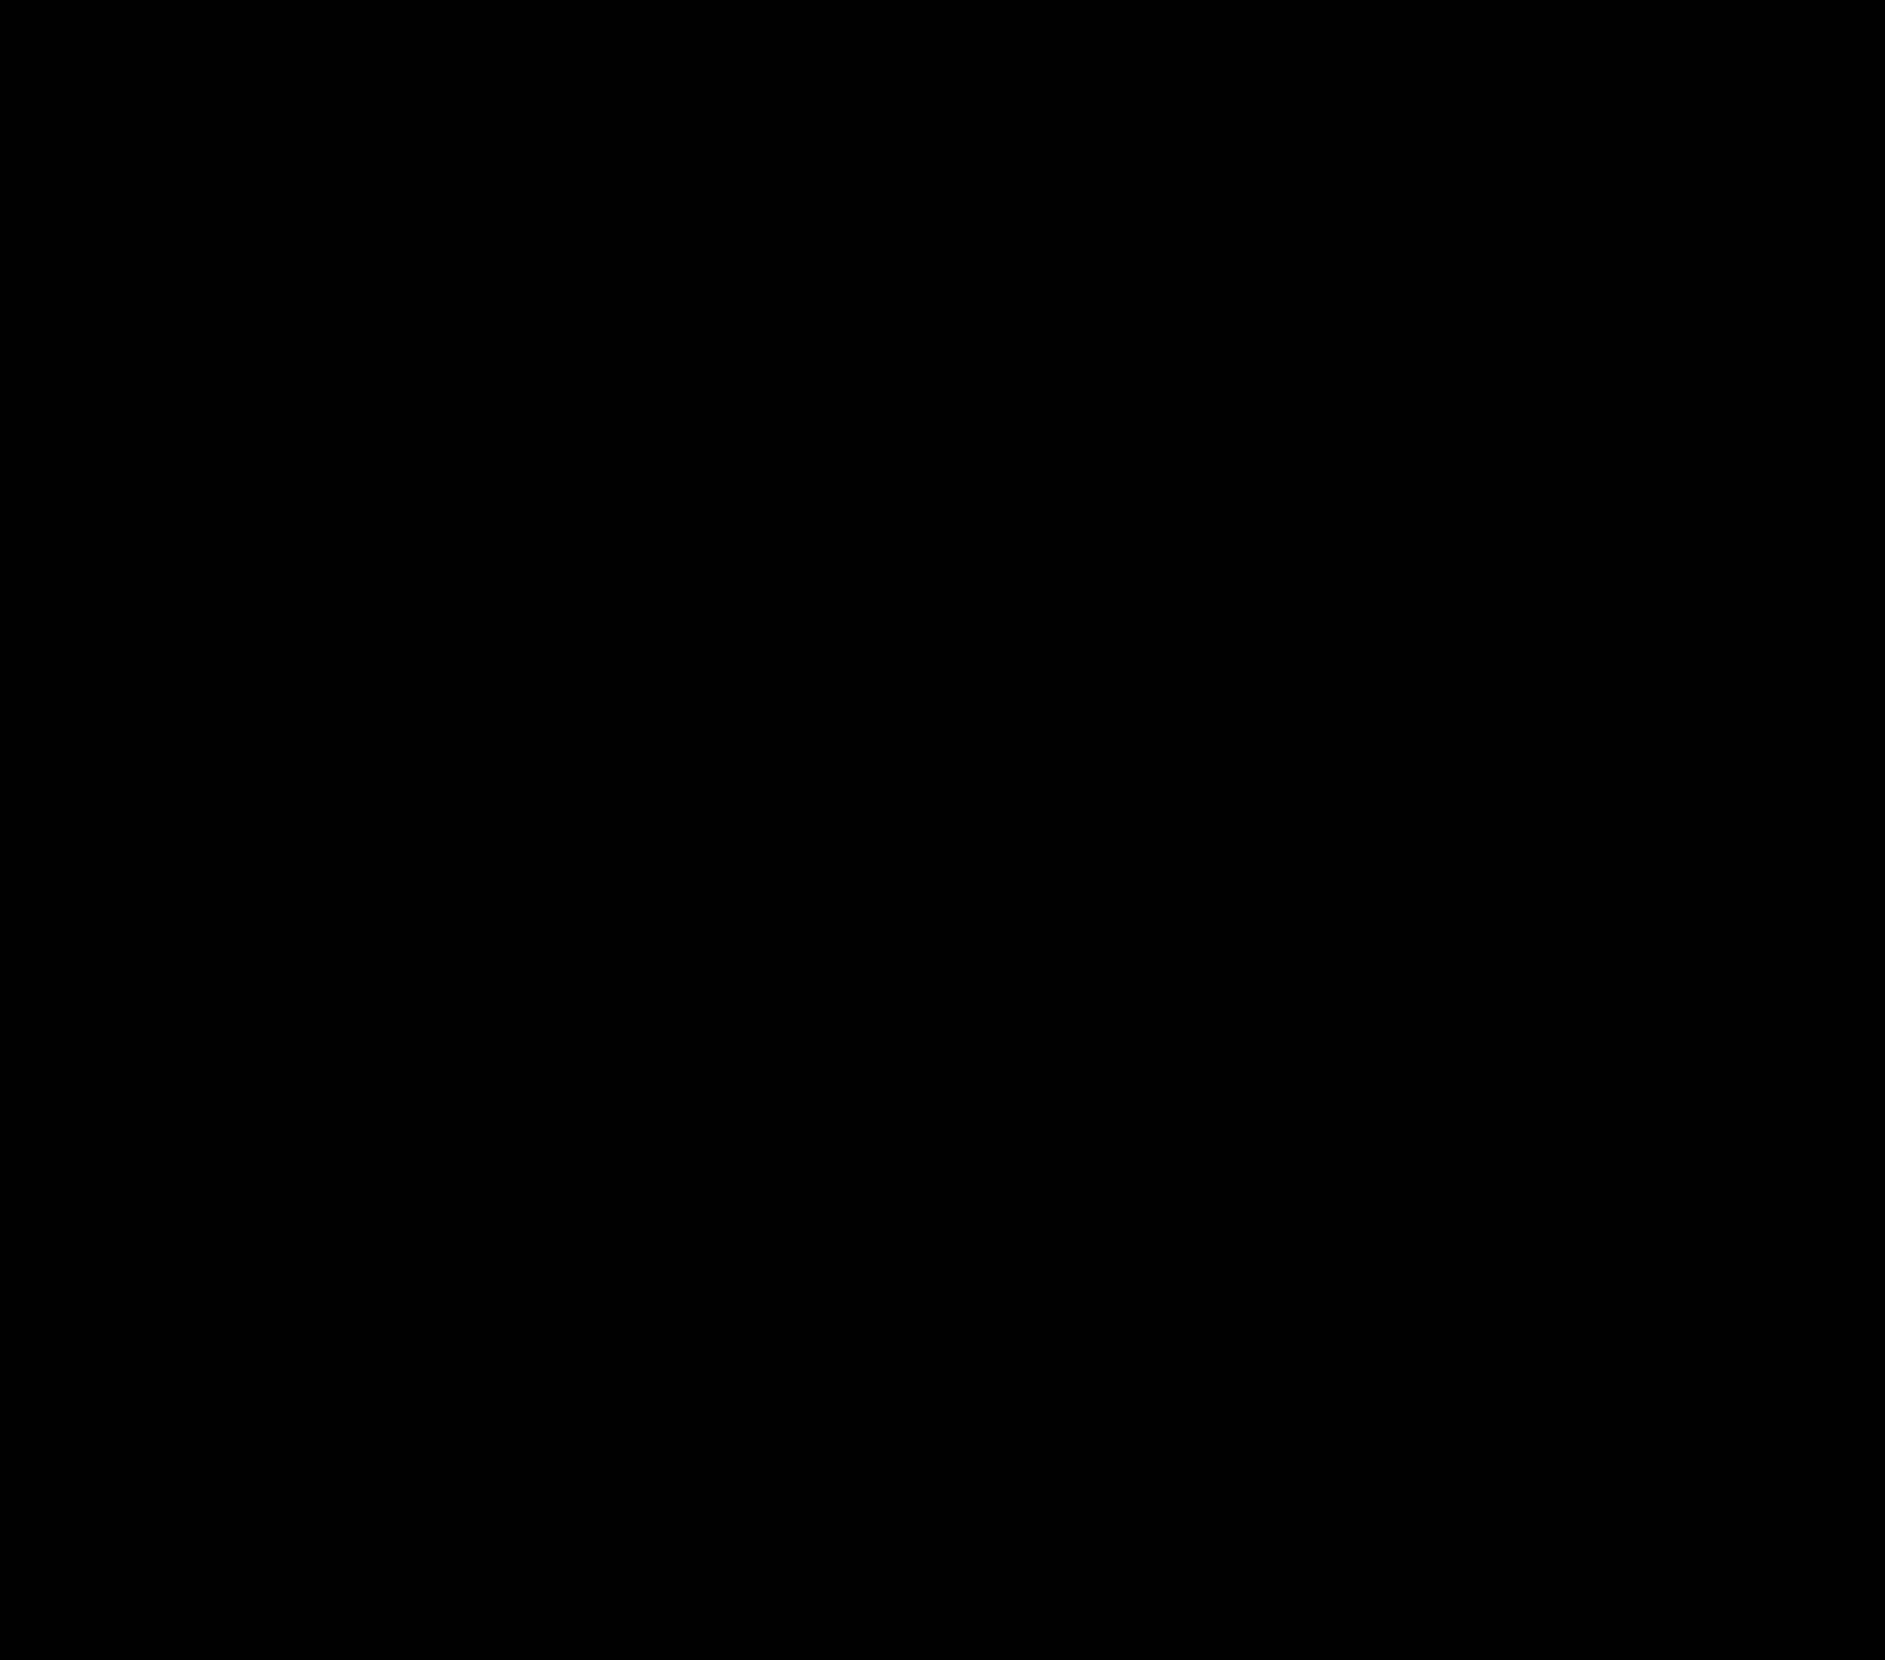 The classic StippleGen test image of Grace Kelly